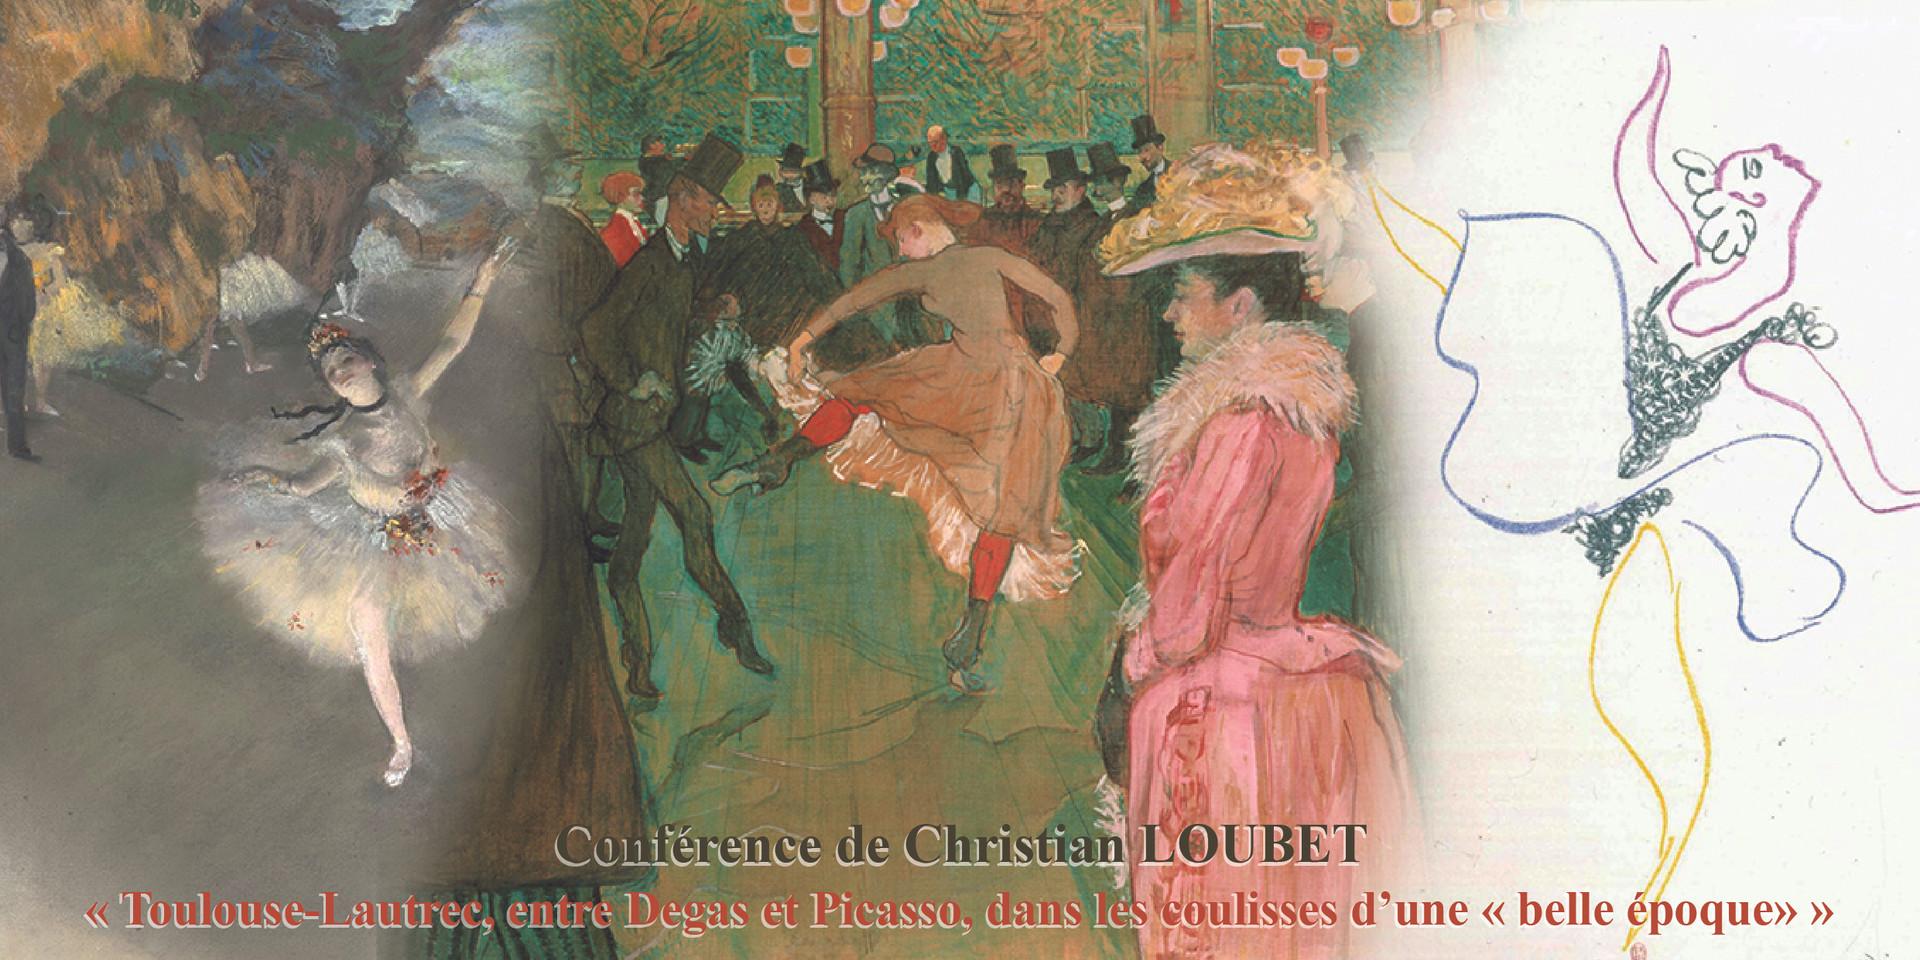 Conférence de Christian Loubet